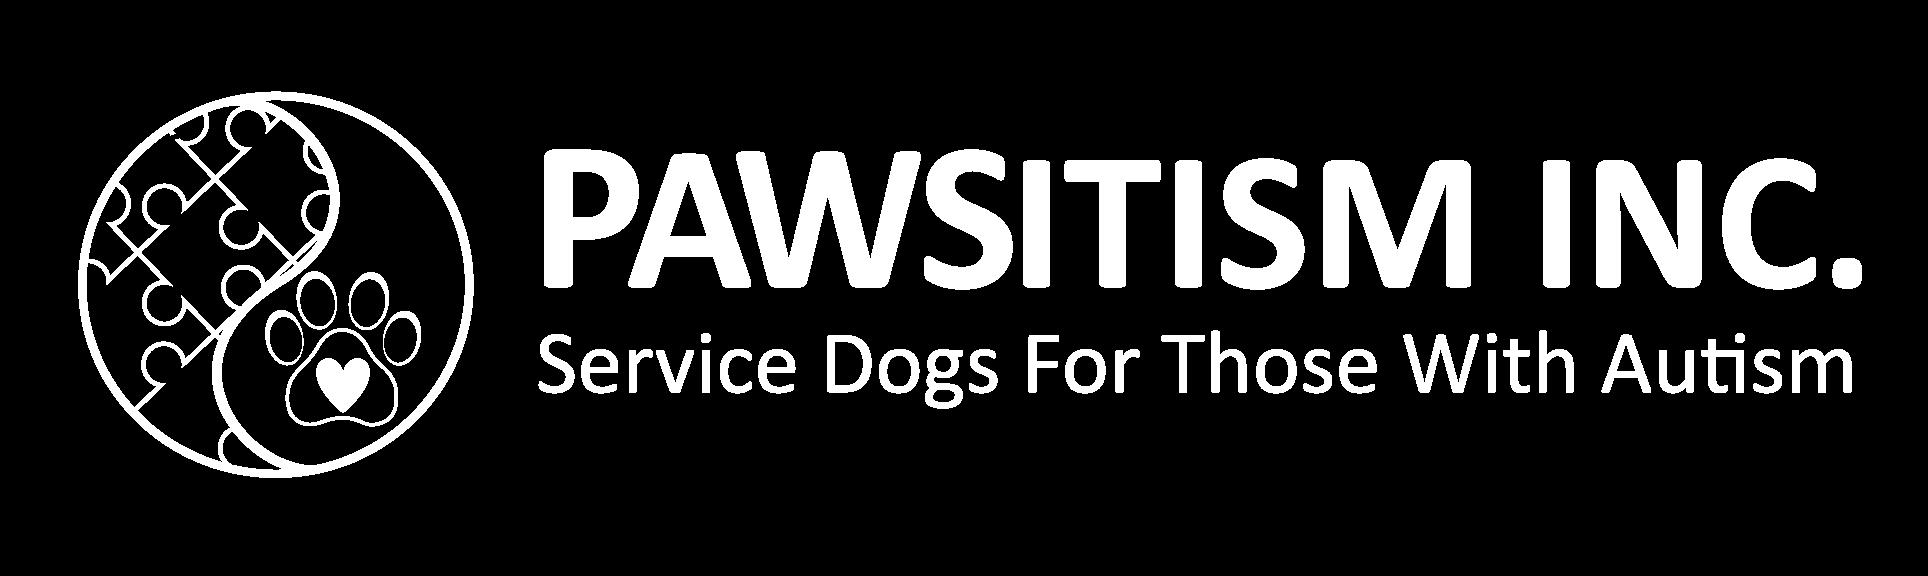 Pawsitism